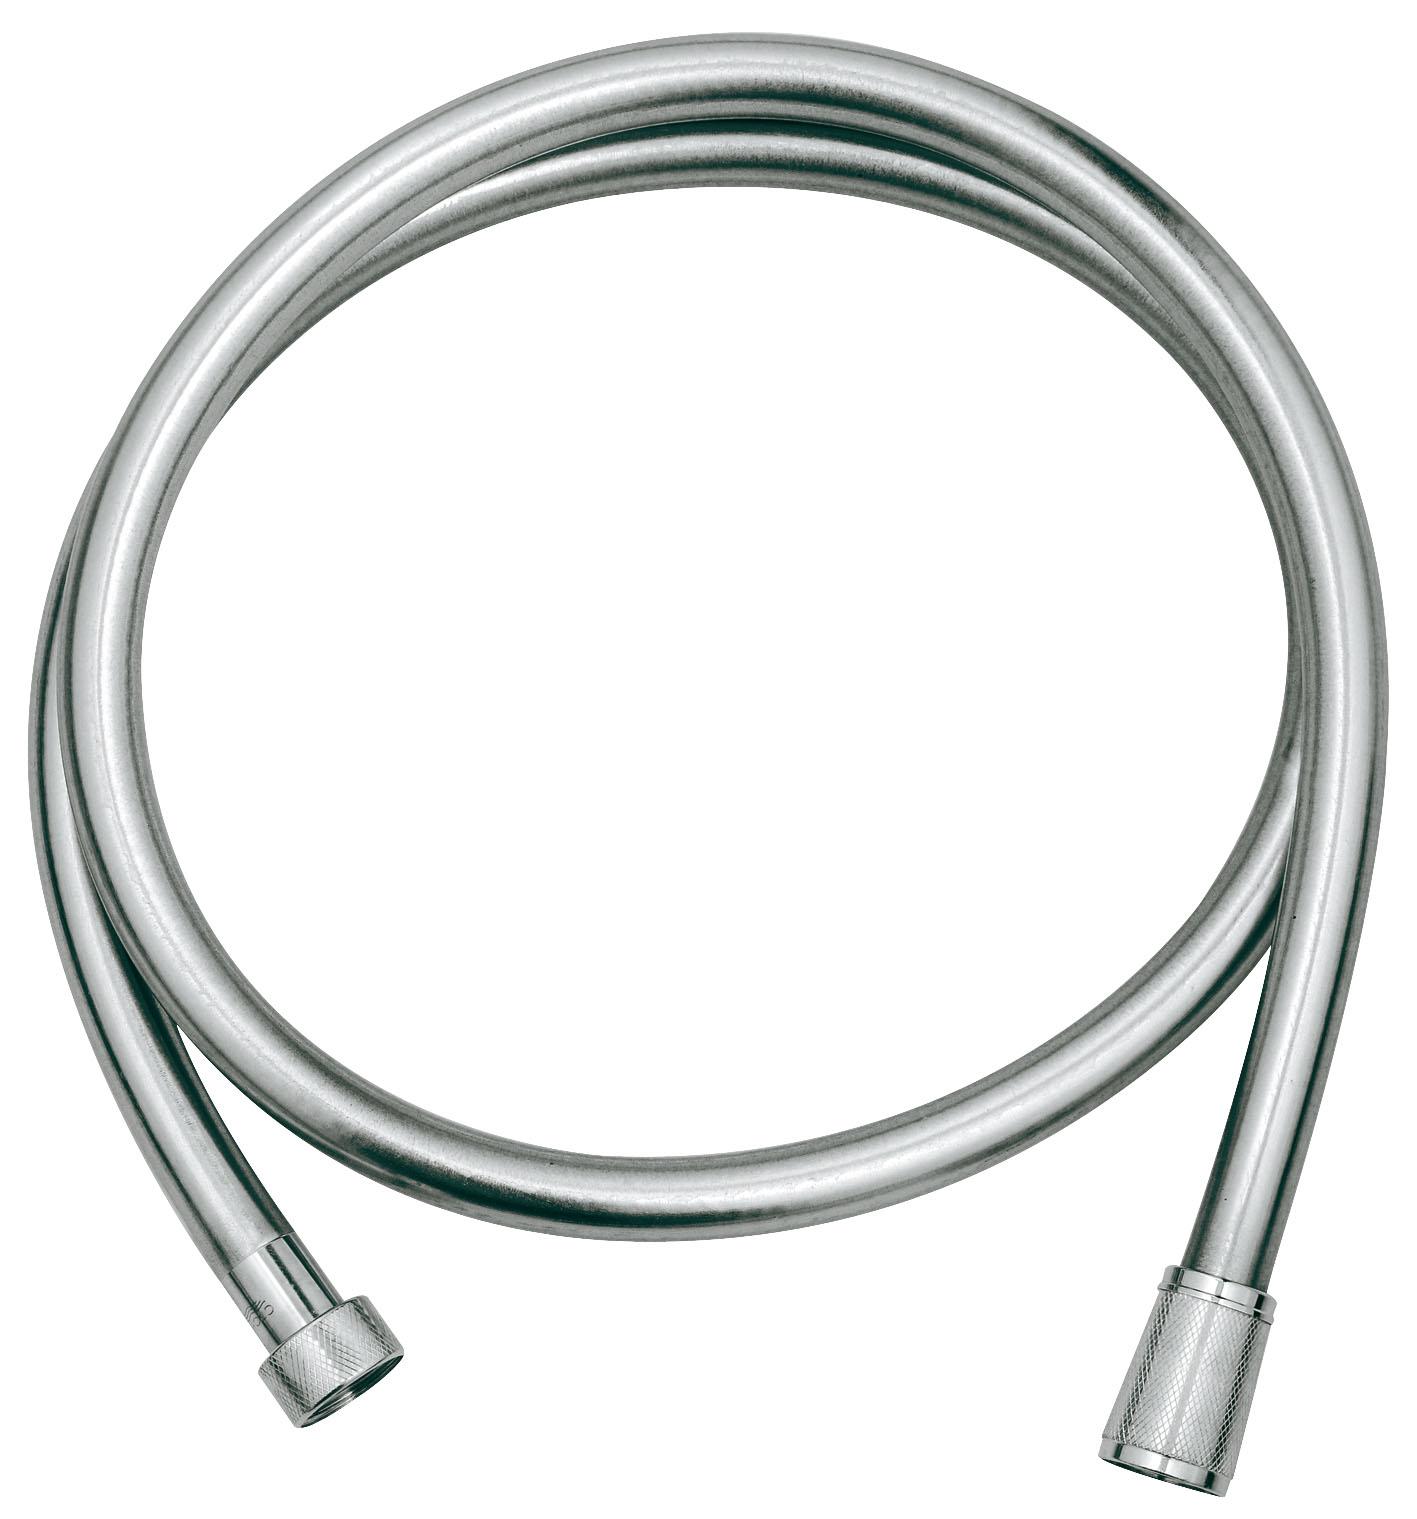 Душевой шланг Grohe Silverflex, длина 1,25 м. 28362000 шланг душевой grohe 28362000 silverflex 1250 мм